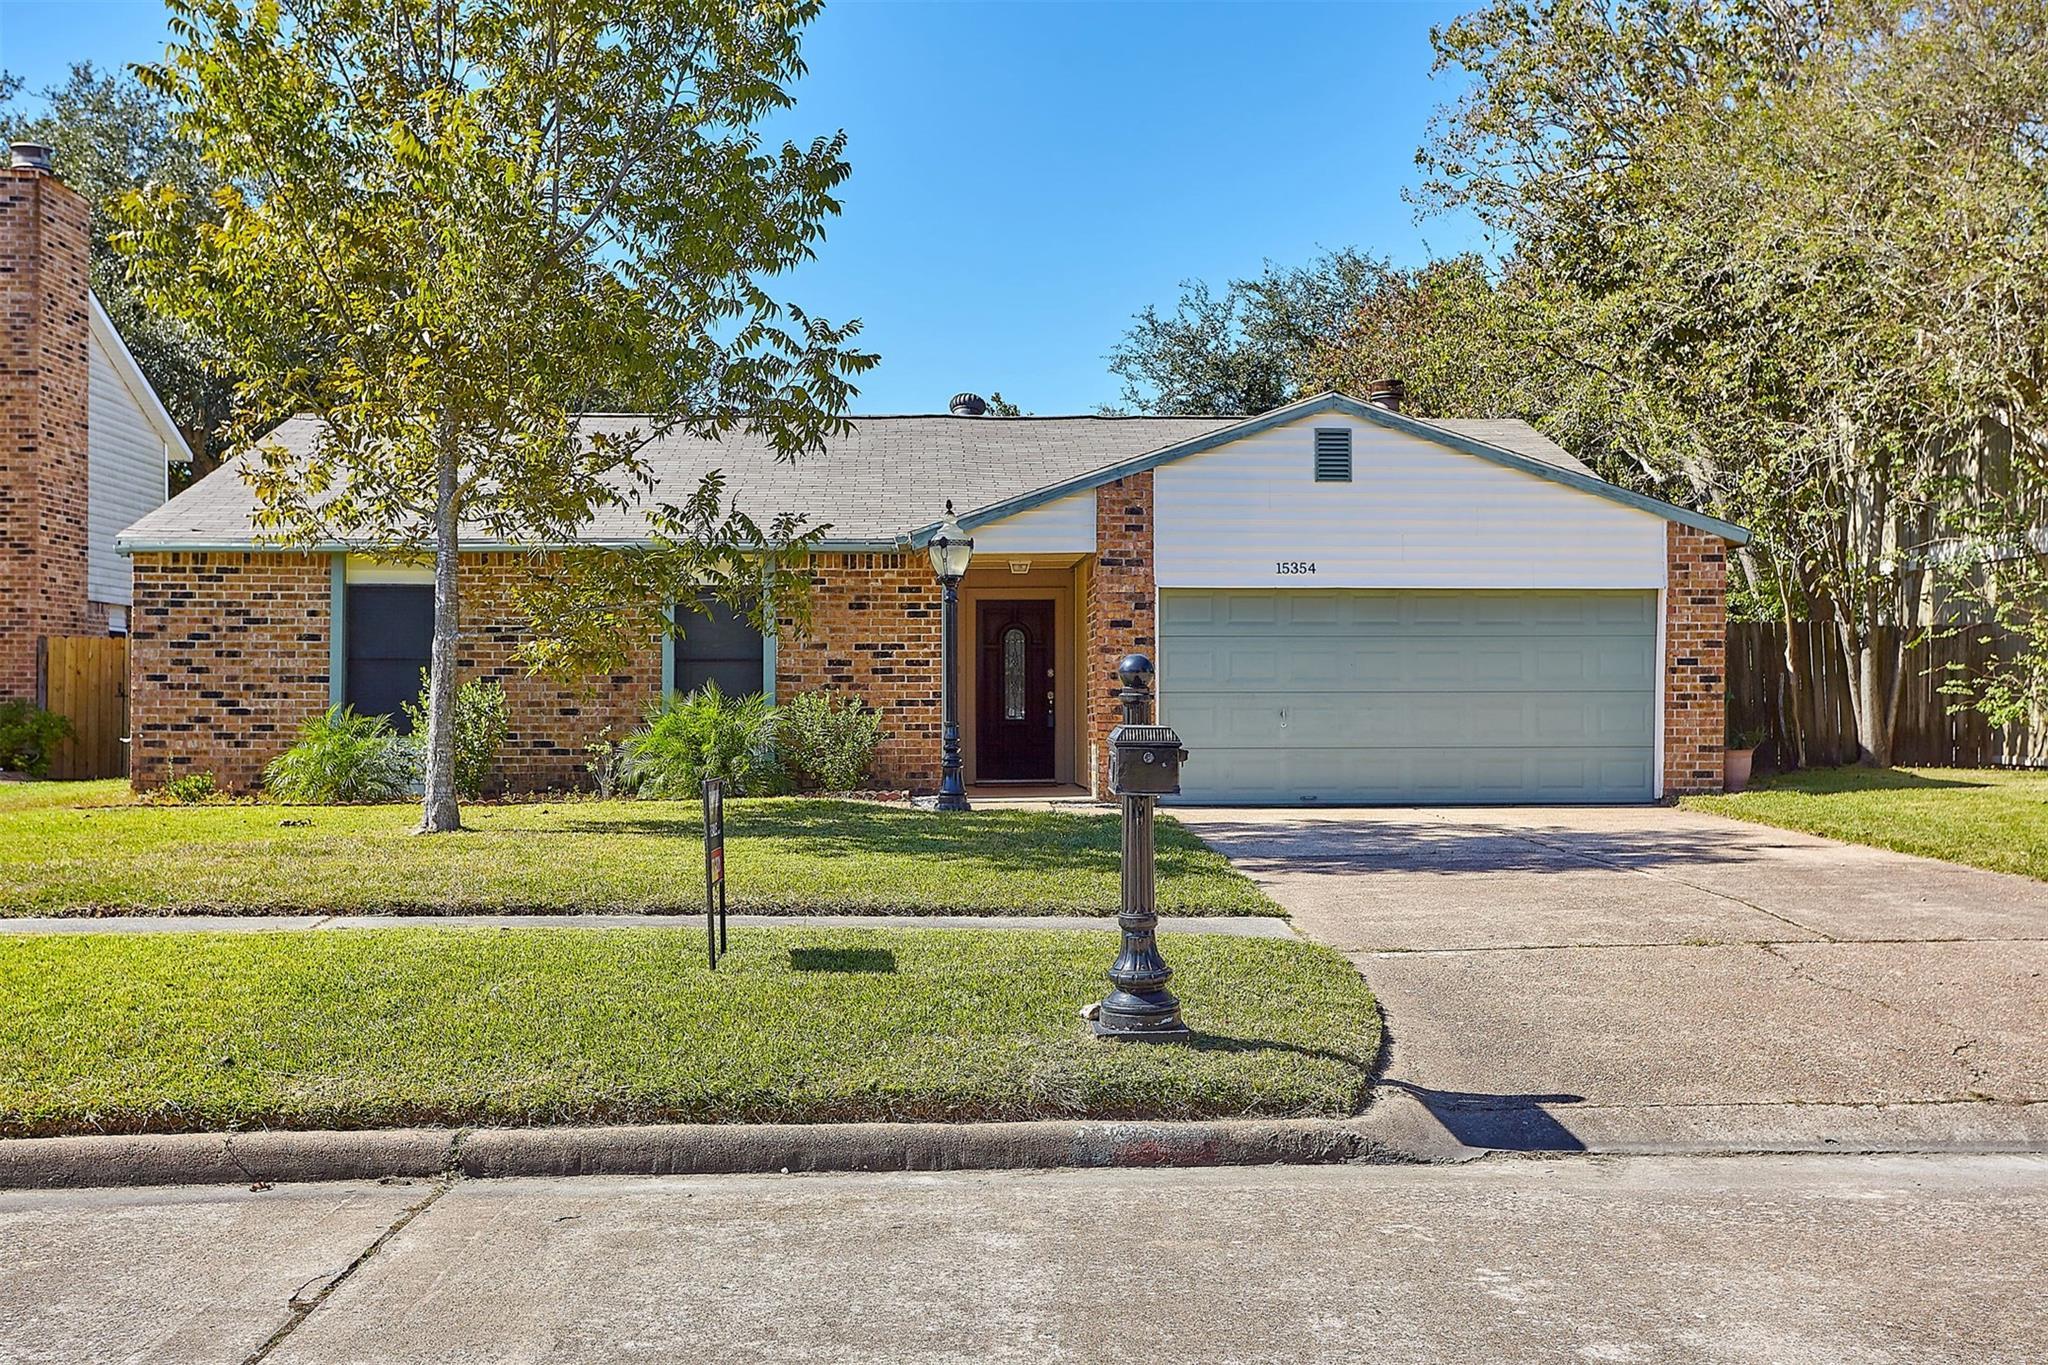 15354 Mcconn Street Property Photo - Houston, TX real estate listing